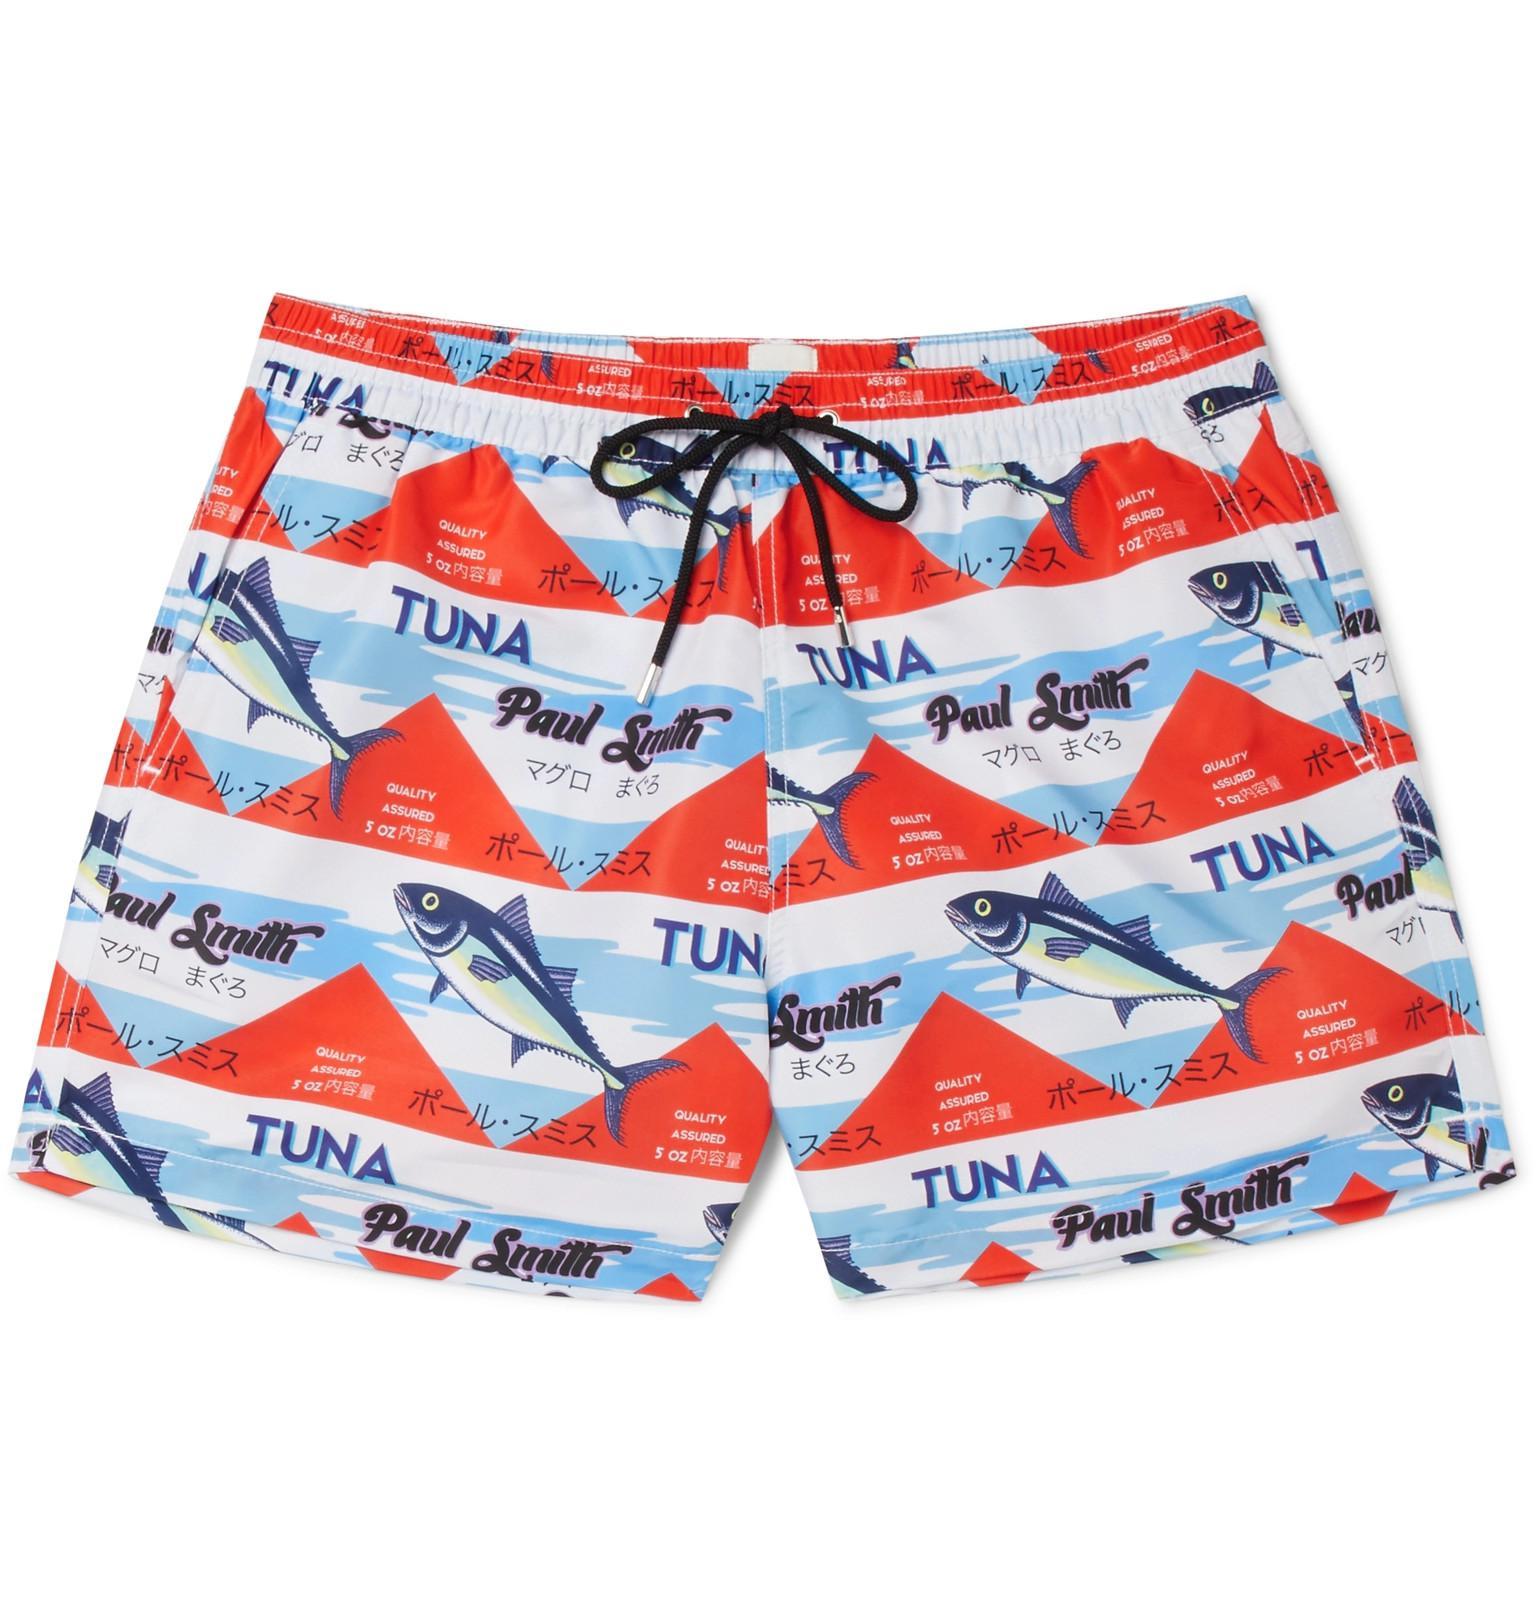 Paul Smith Short-length Printed Swim Shorts - Multi e3WR5s4A6